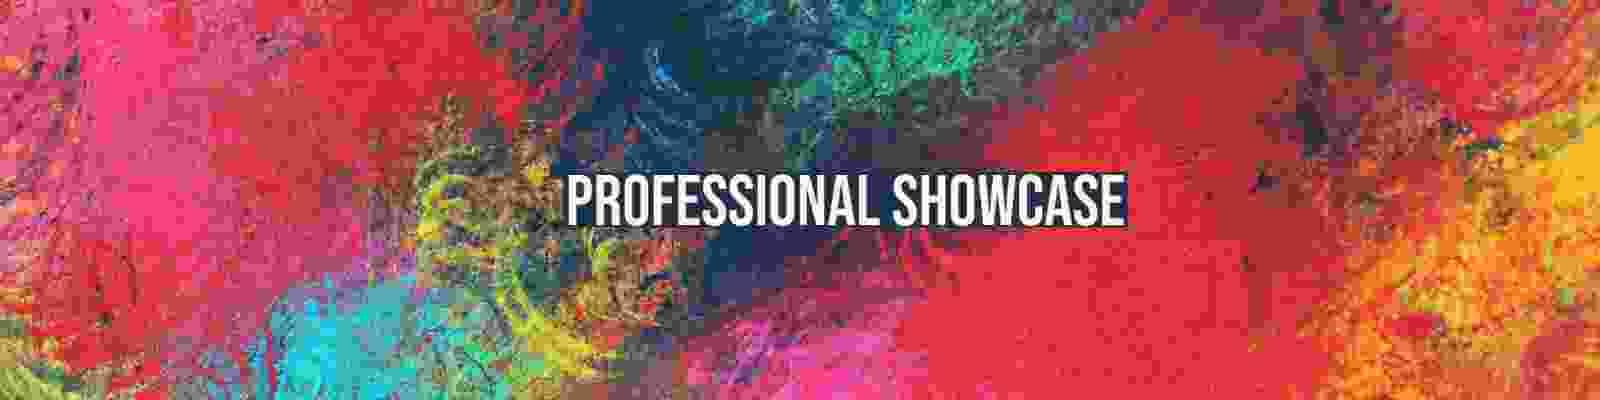 Low qual professional showcase 1